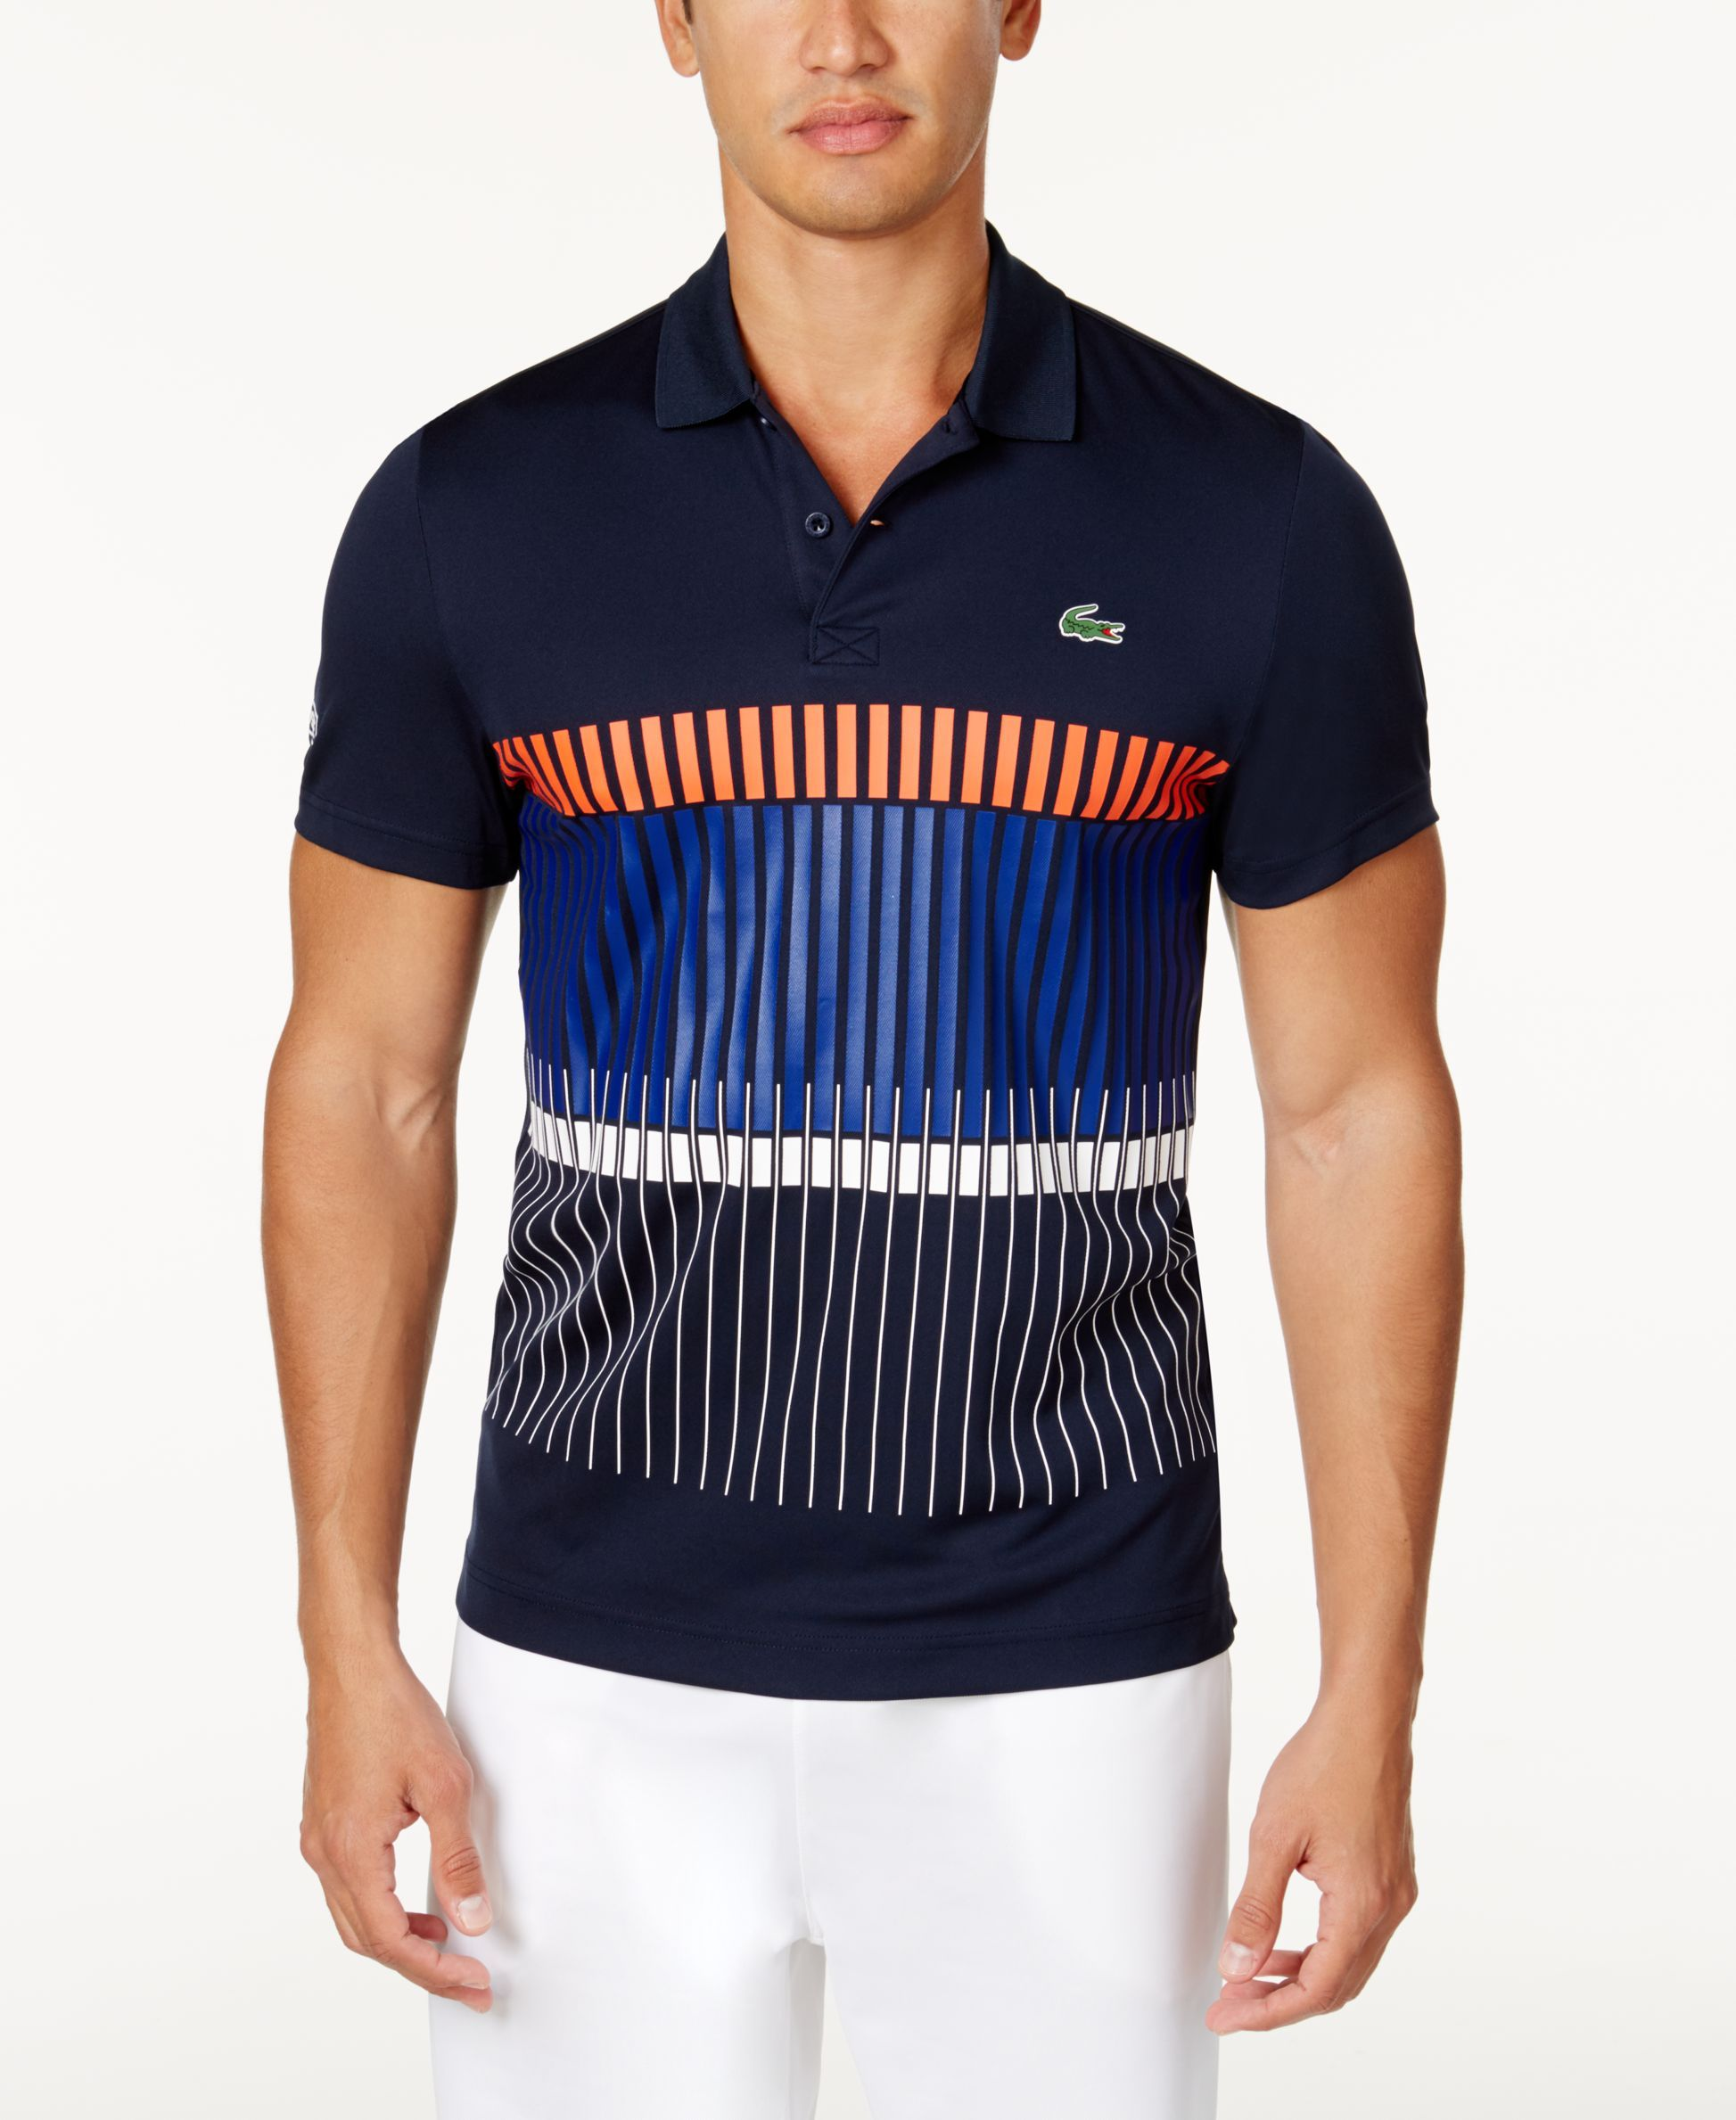 Lacoste Collection for Novak Djokovic Men s UltraDry Performance Polo b12e982941a